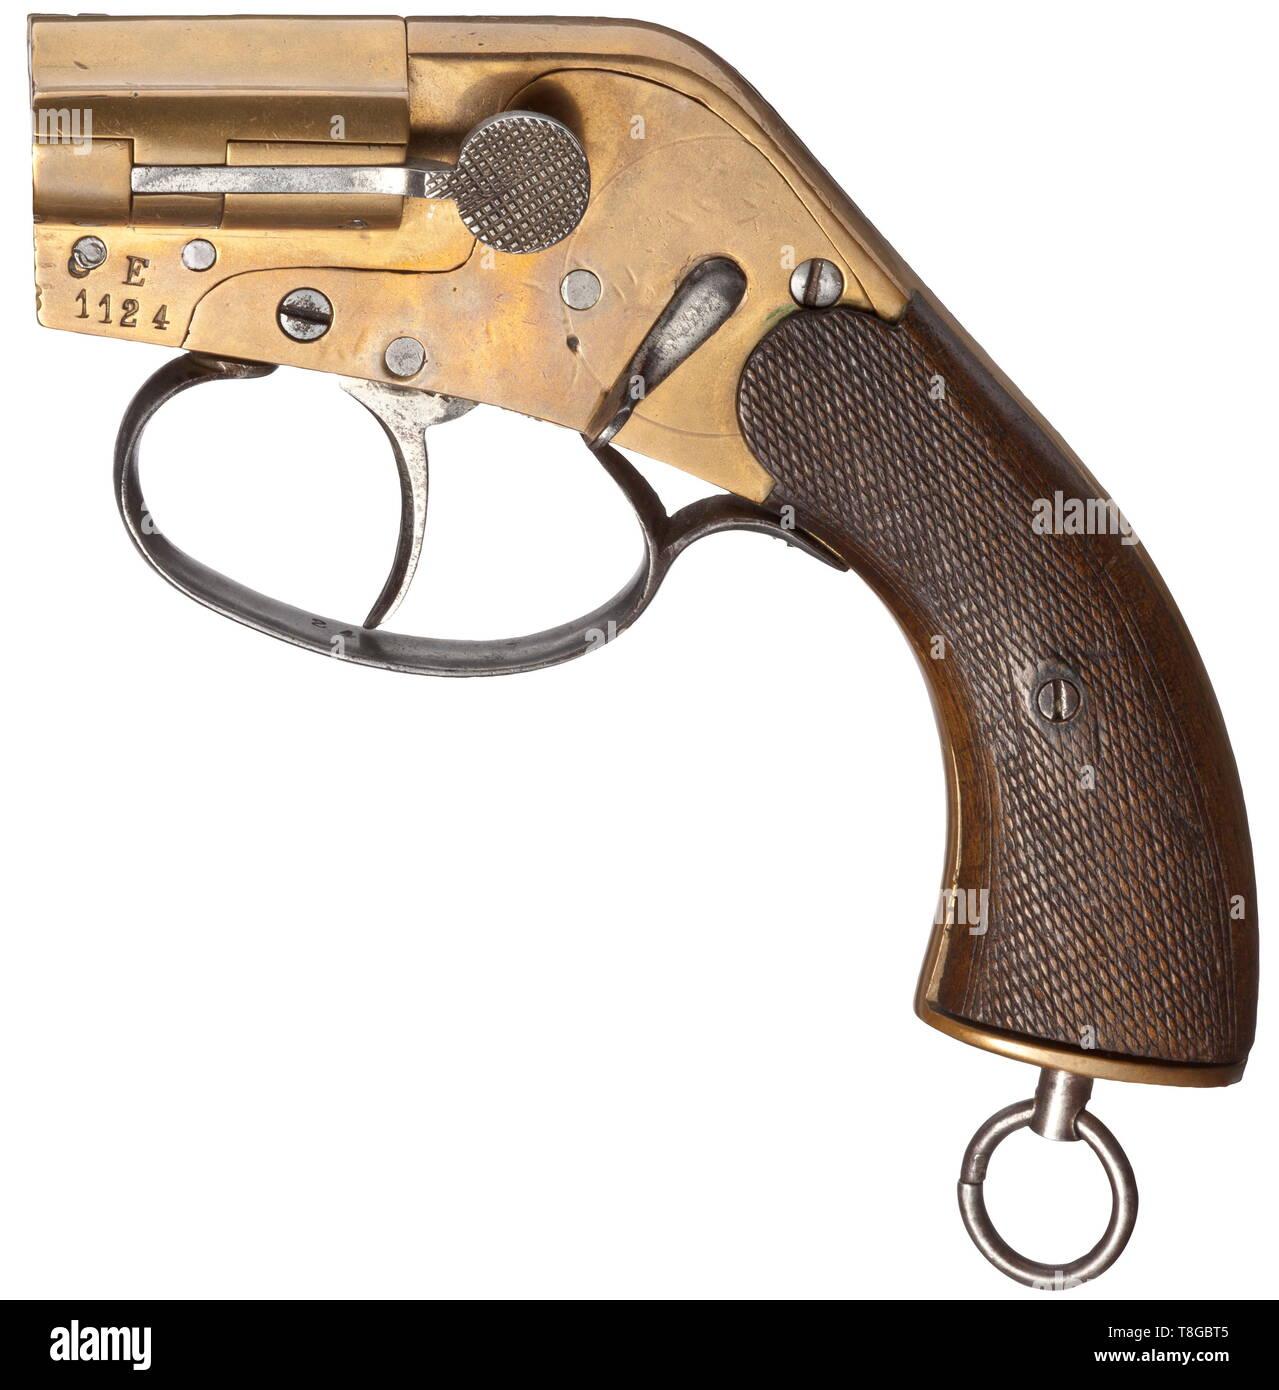 Flare Pistol Stock Photos & Flare Pistol Stock Images - Alamy